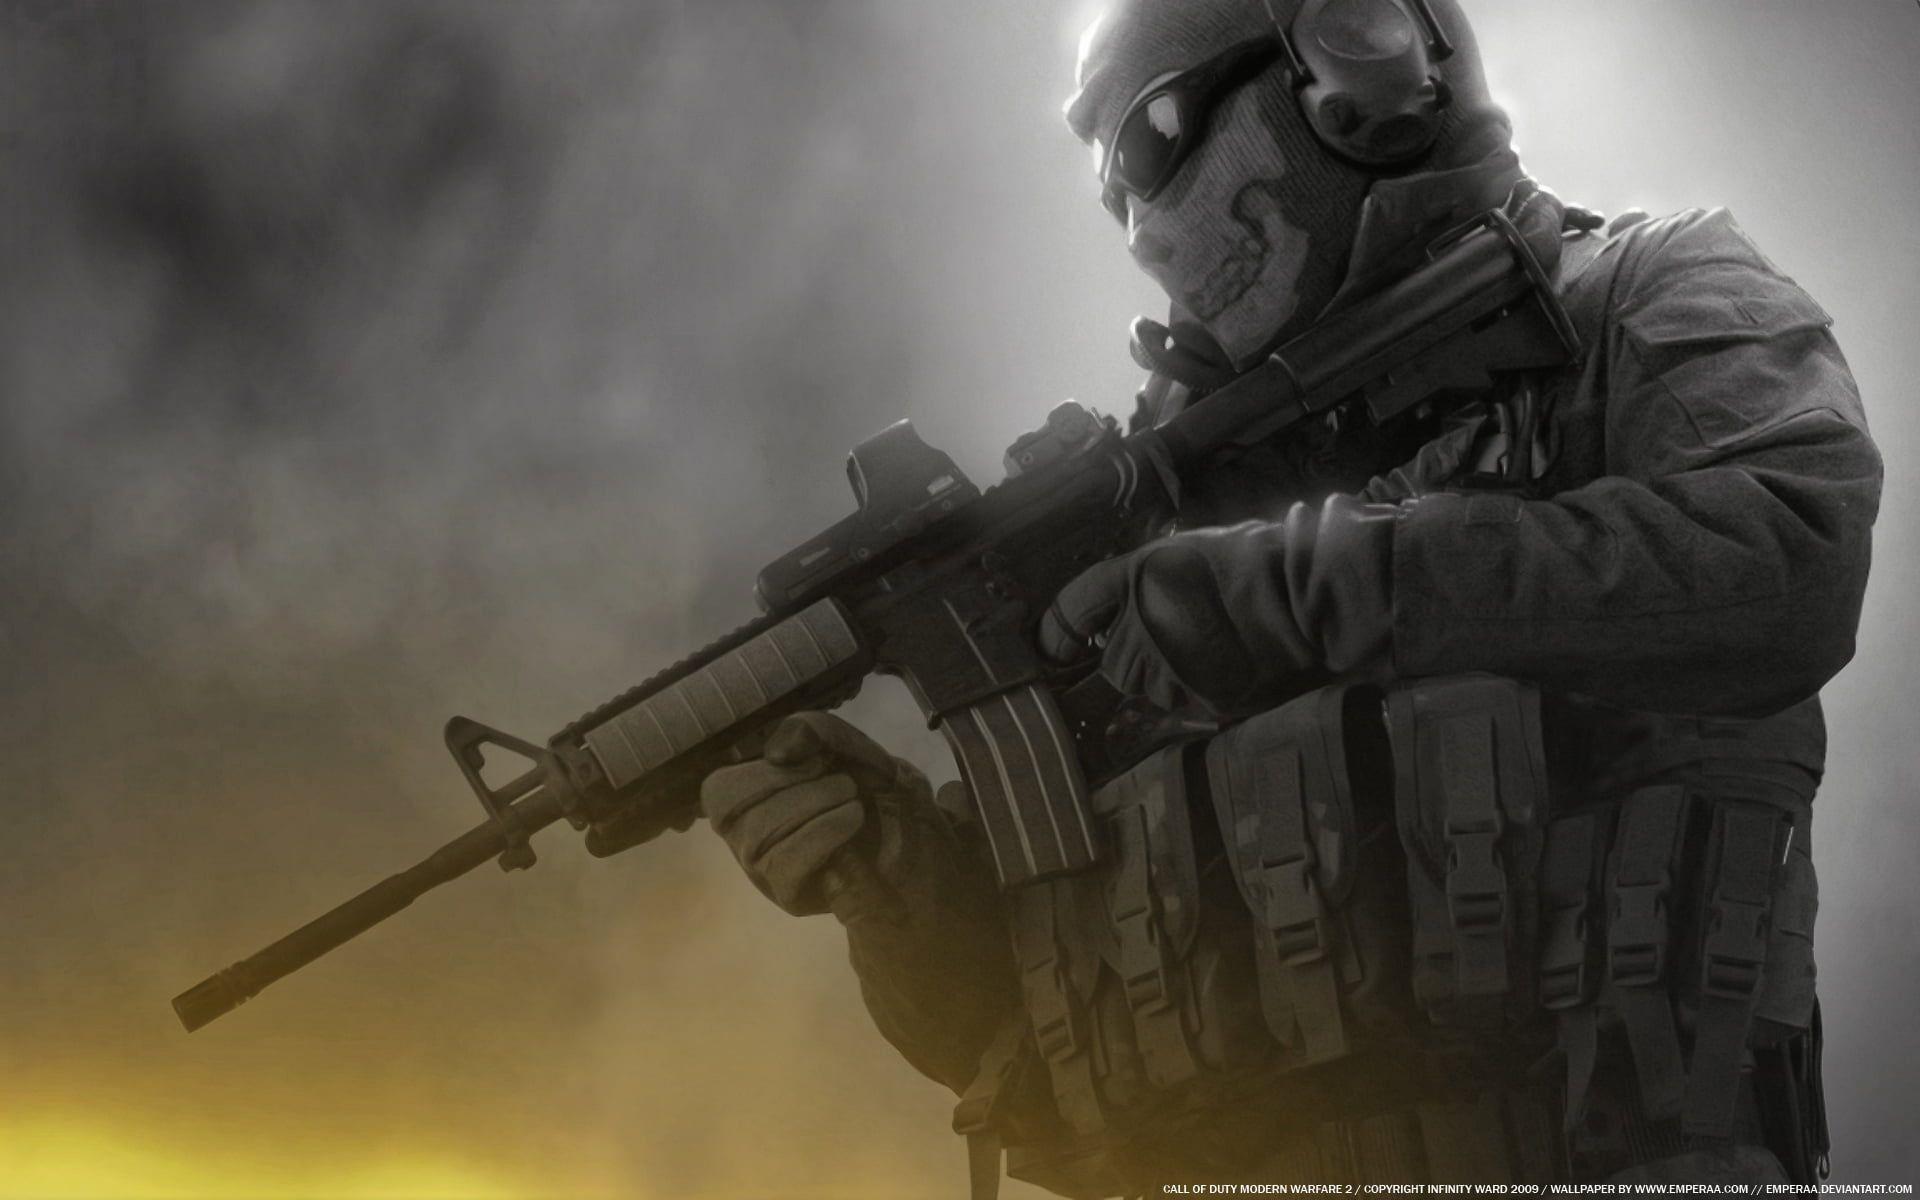 Soldier Digital Wallpaper Skull Glasses Soldiers Machine Ghost Modern Warfare 2 Call Of Duty Unloadi In 2020 Call Of Duty Ghosts Digital Wallpaper Modern Warfare